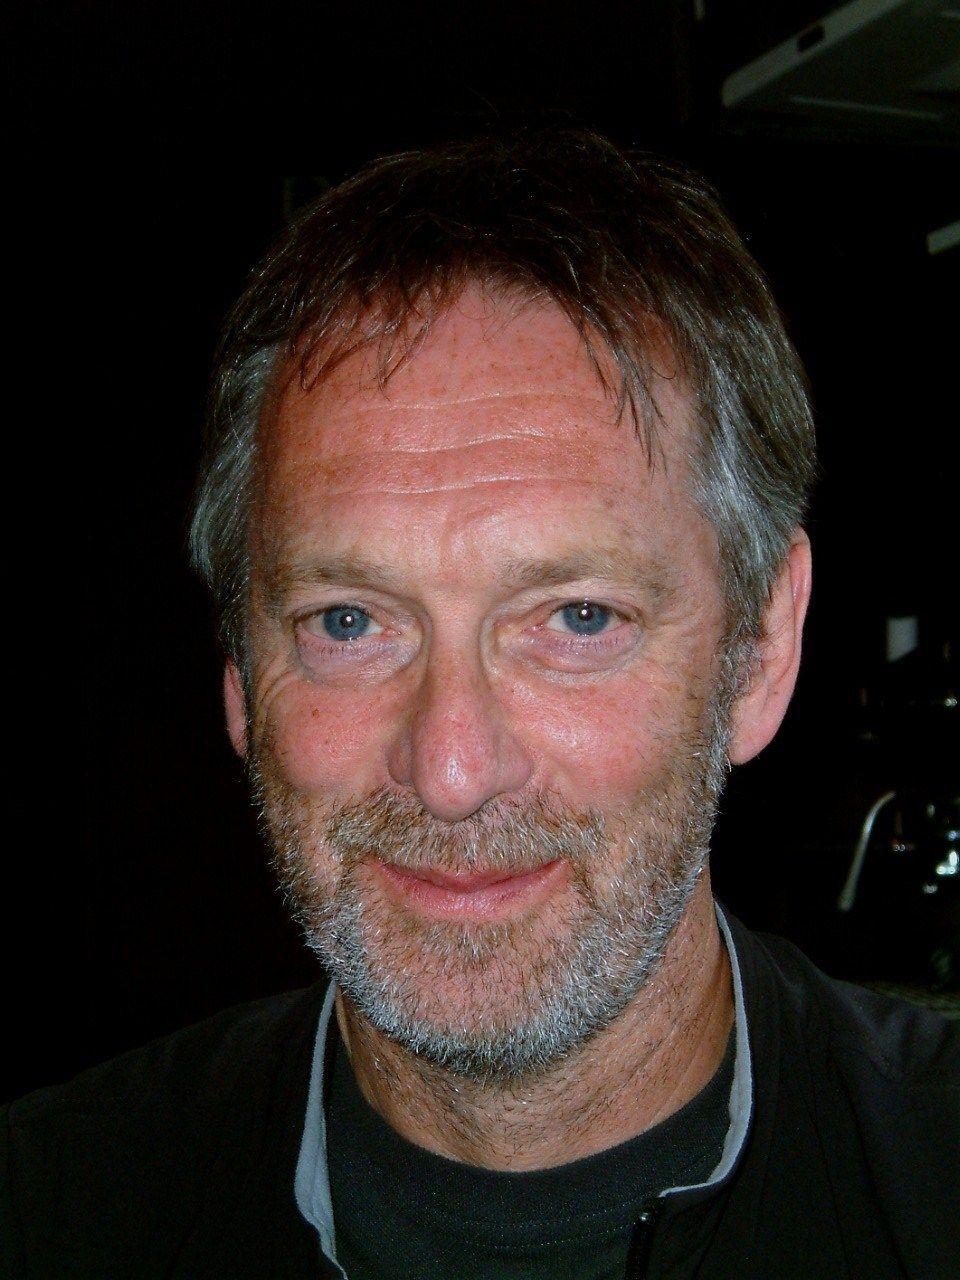 Poetry Surgery (Edinburgh) with John Glenday